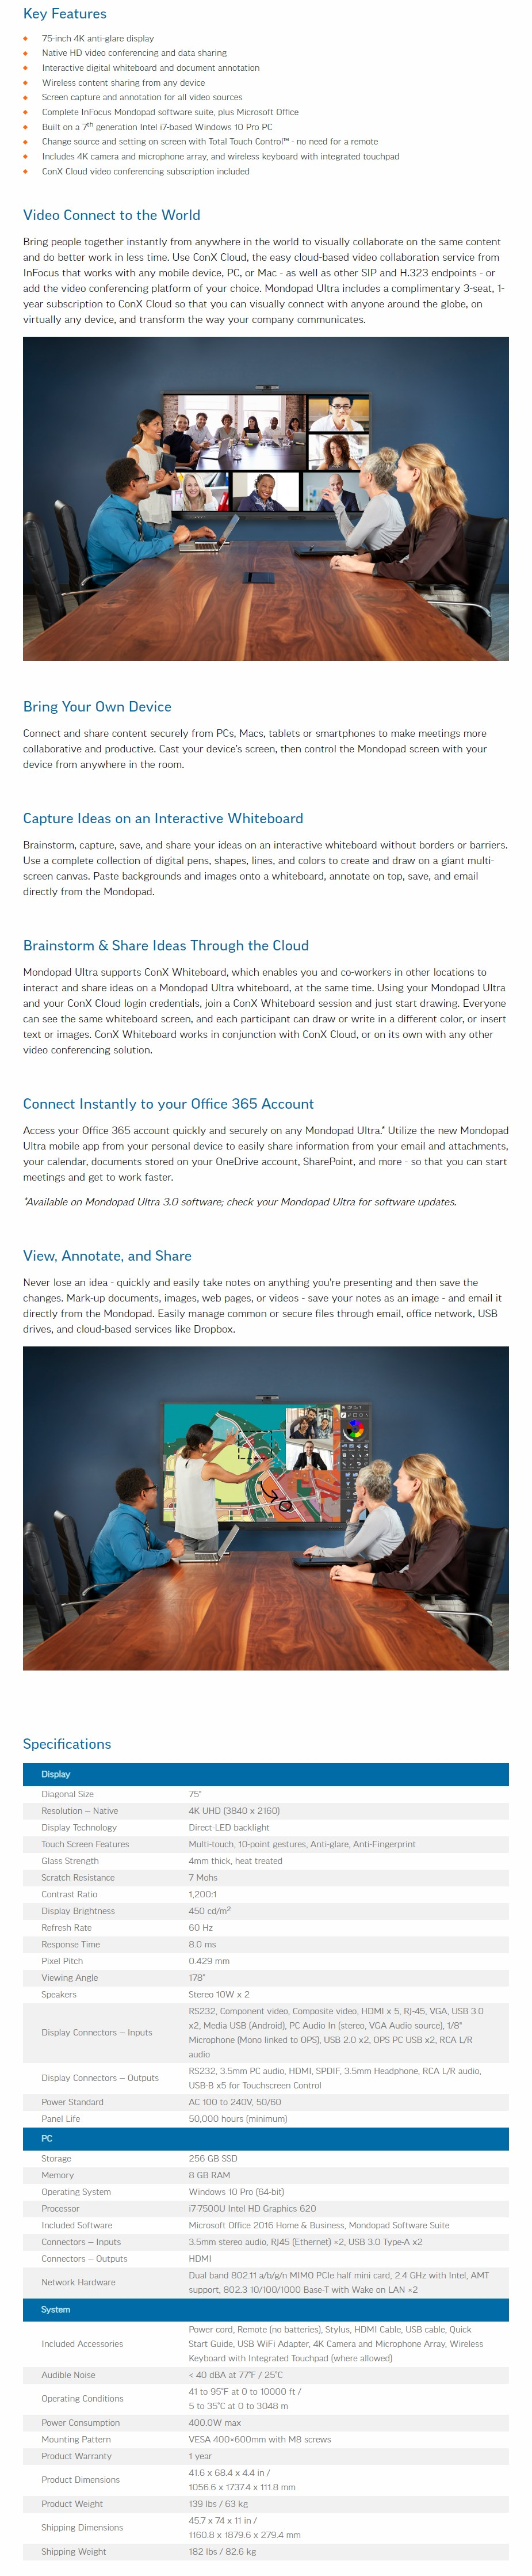 "InFocus Mondopad Ultra 4K UHD 75"" Touch Display - Win10 Pro - Overview 1"